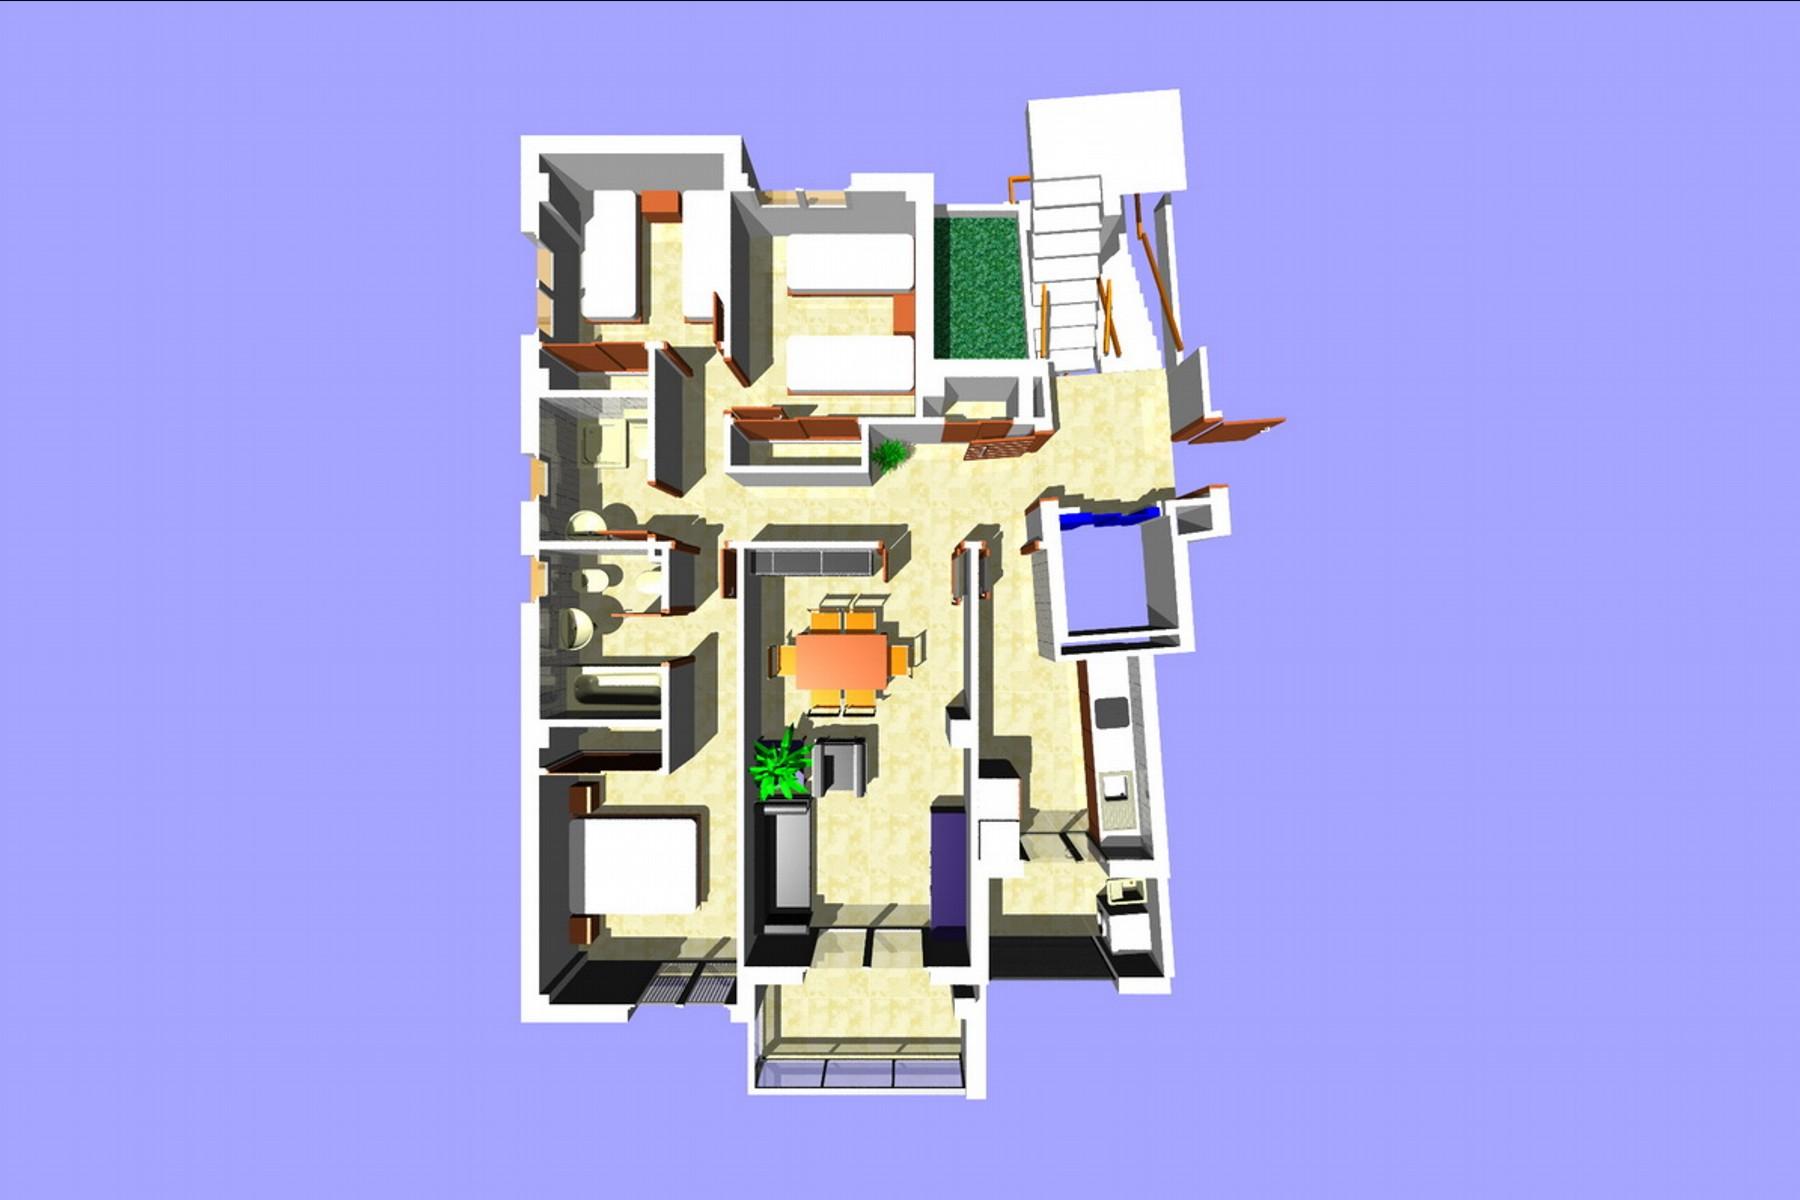 Imaginarq-155-Edificio-Viviendas-Altea-Alicante-54A